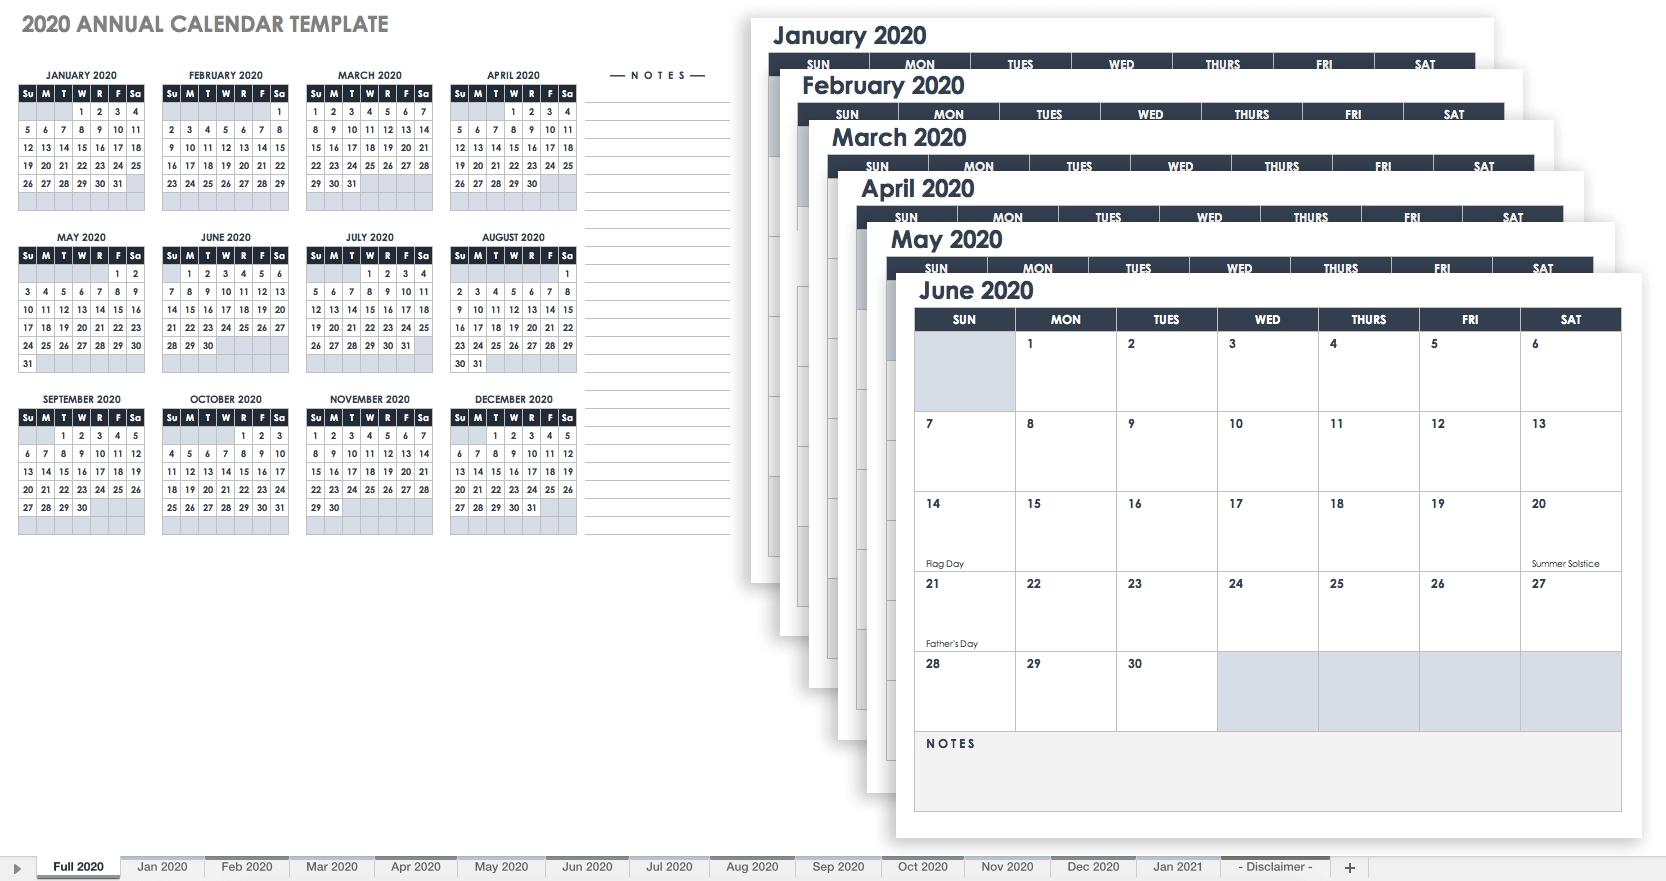 Free Blank Calendar Templates - Smartsheet regarding 31 Day Blank Calendar Template